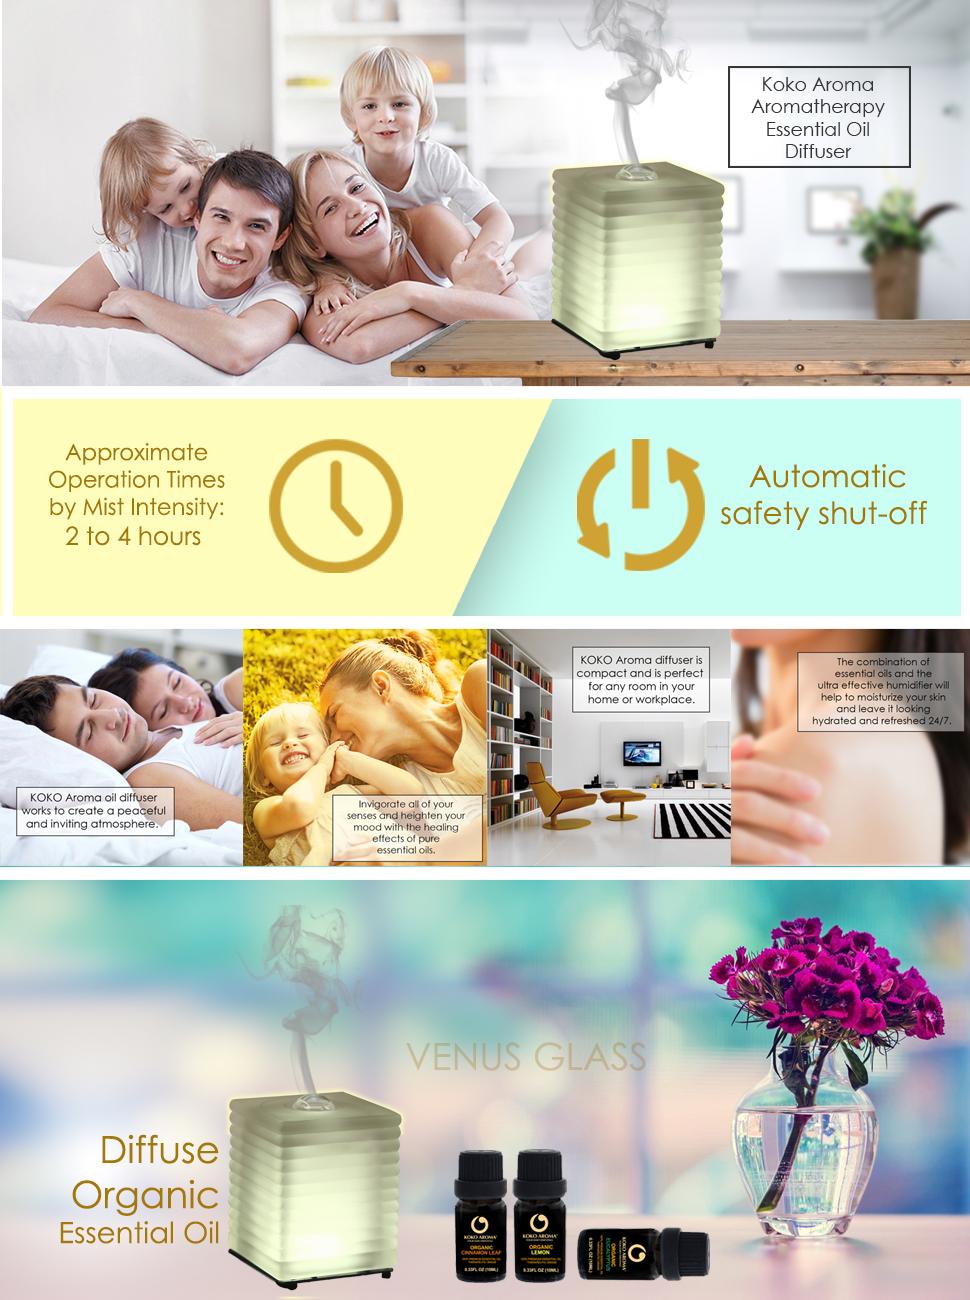 Amazon Com Koko Aroma Aromatherapy Essential Oil Diffuser On Sale Limited Time Venus Glass